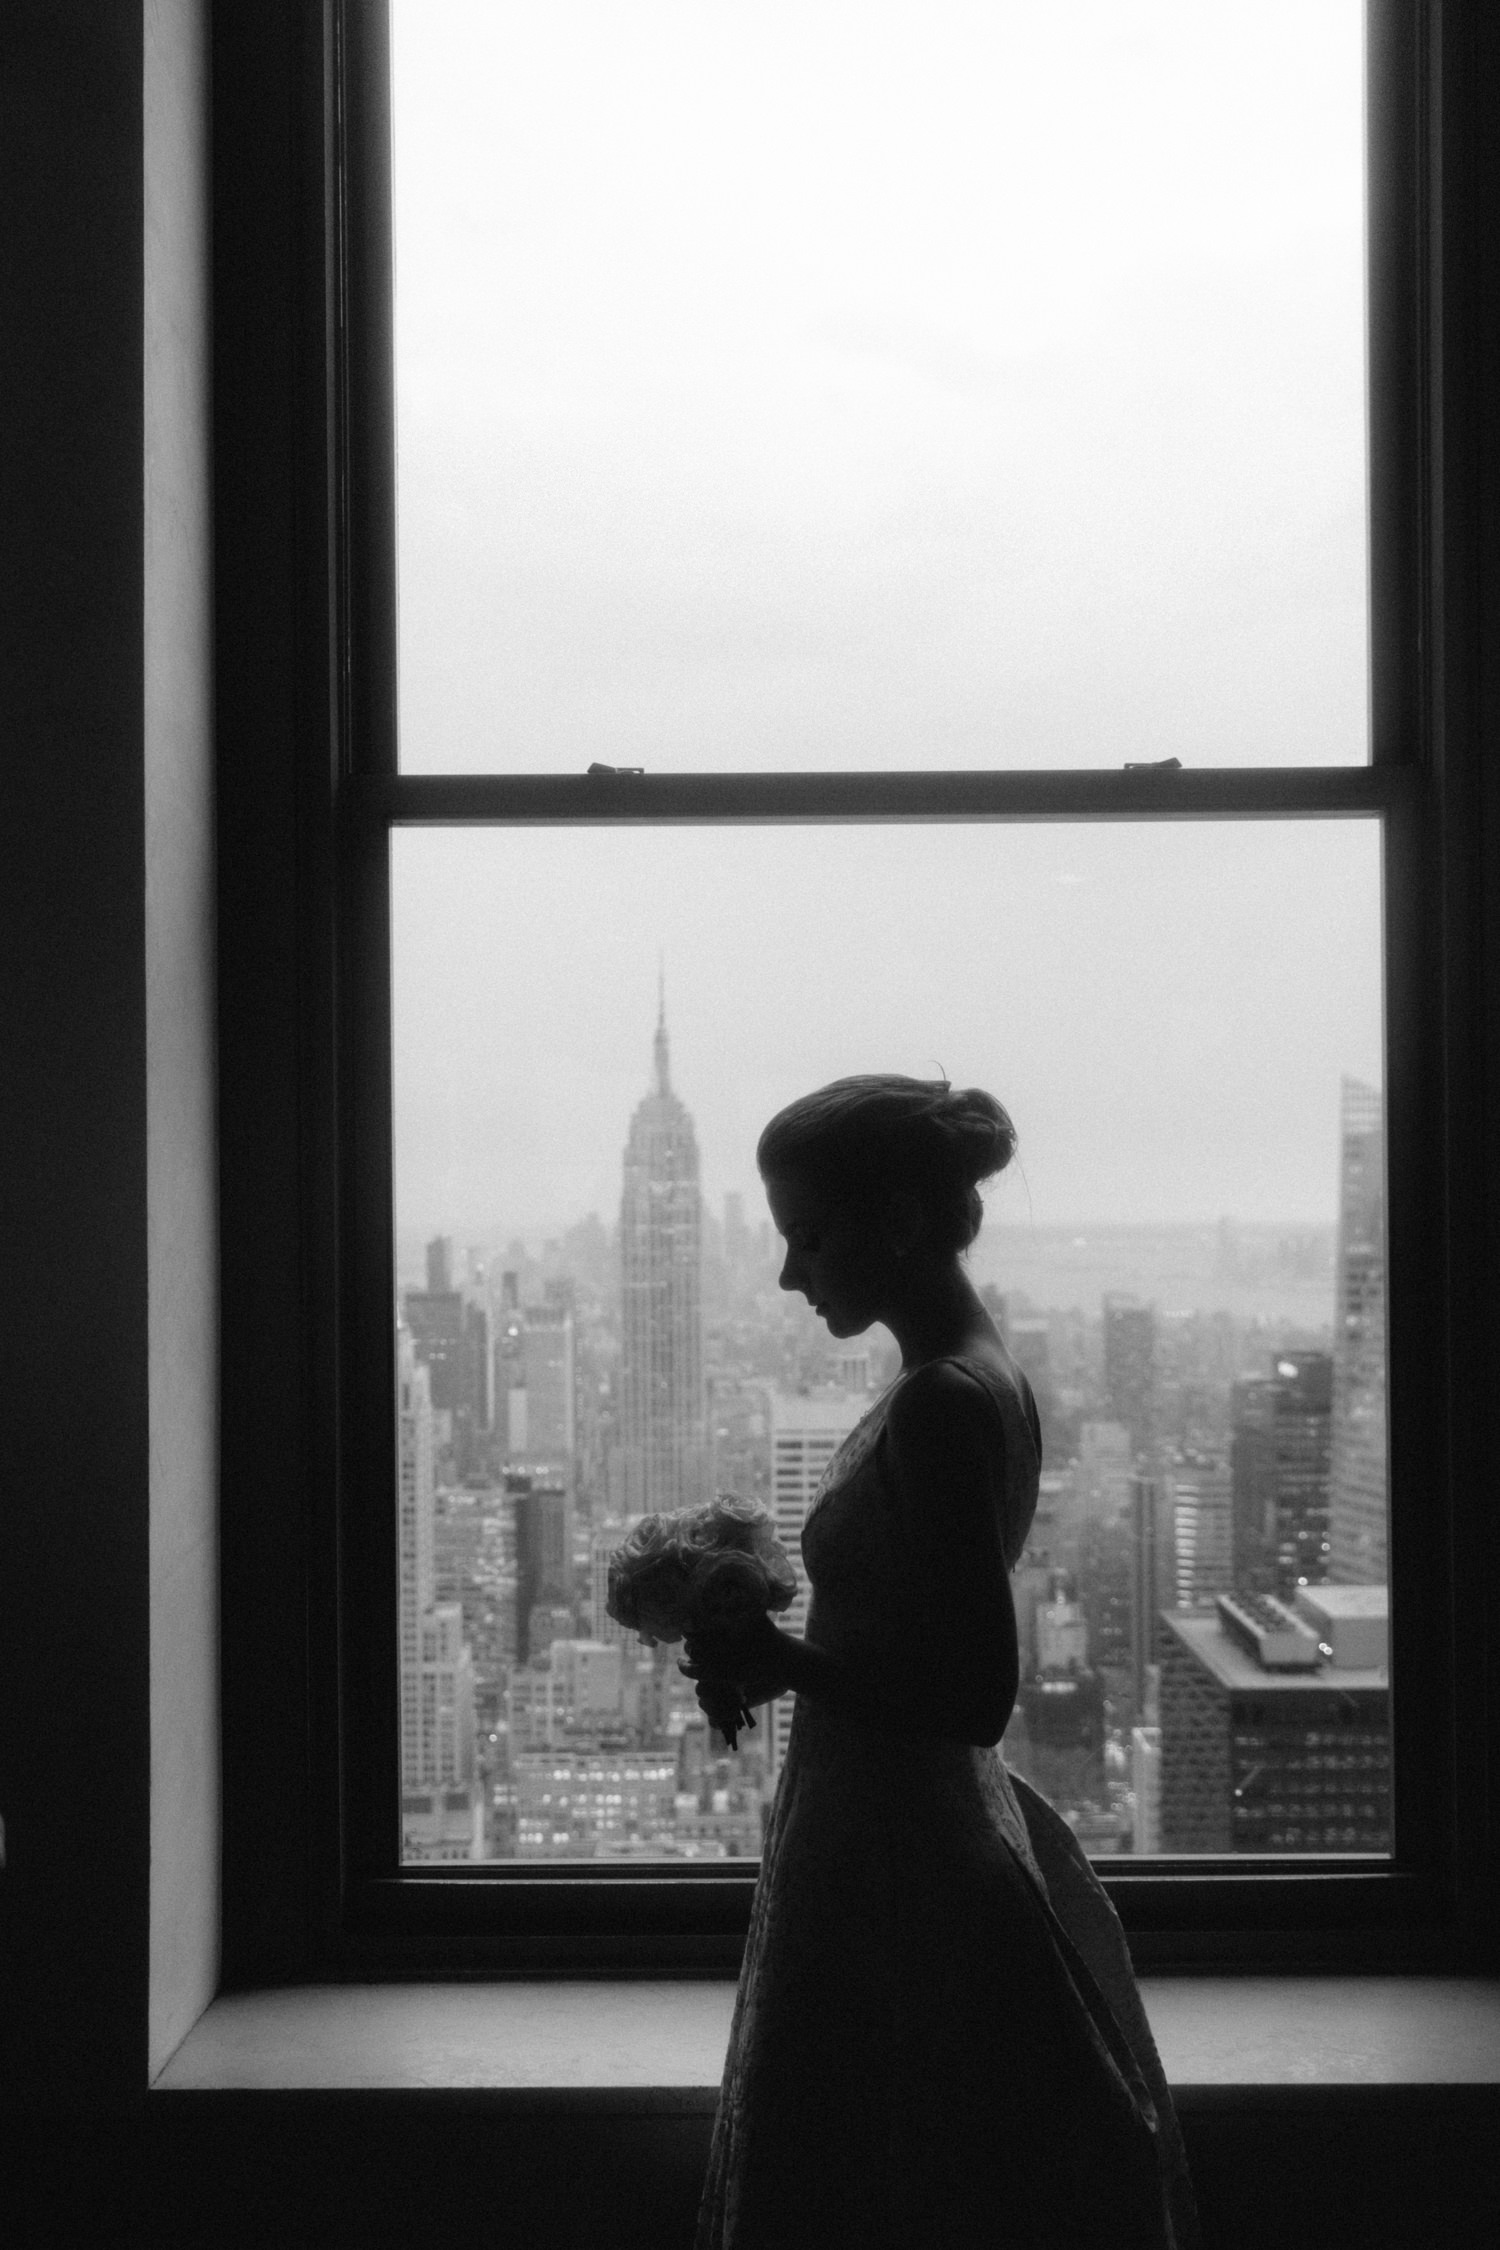 NYC-Top-of-the-Rock-wedding-photos-L&B-26.jpg